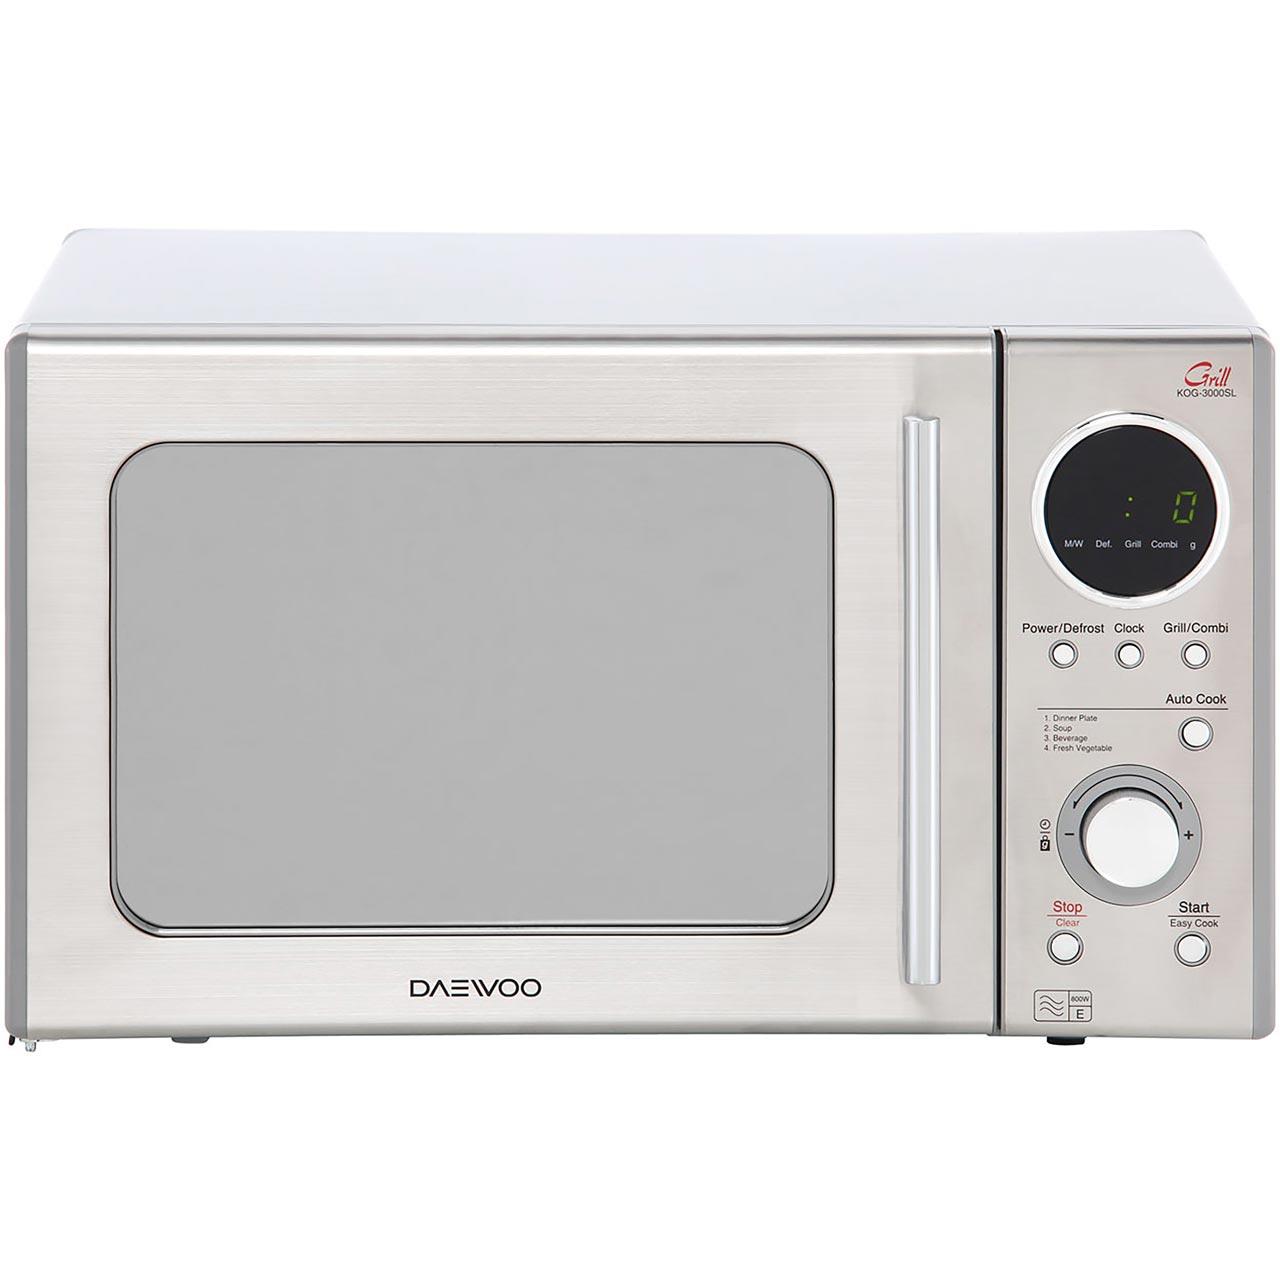 KOG3000SL_SI | Daewoo Microwave Oven | ao.com